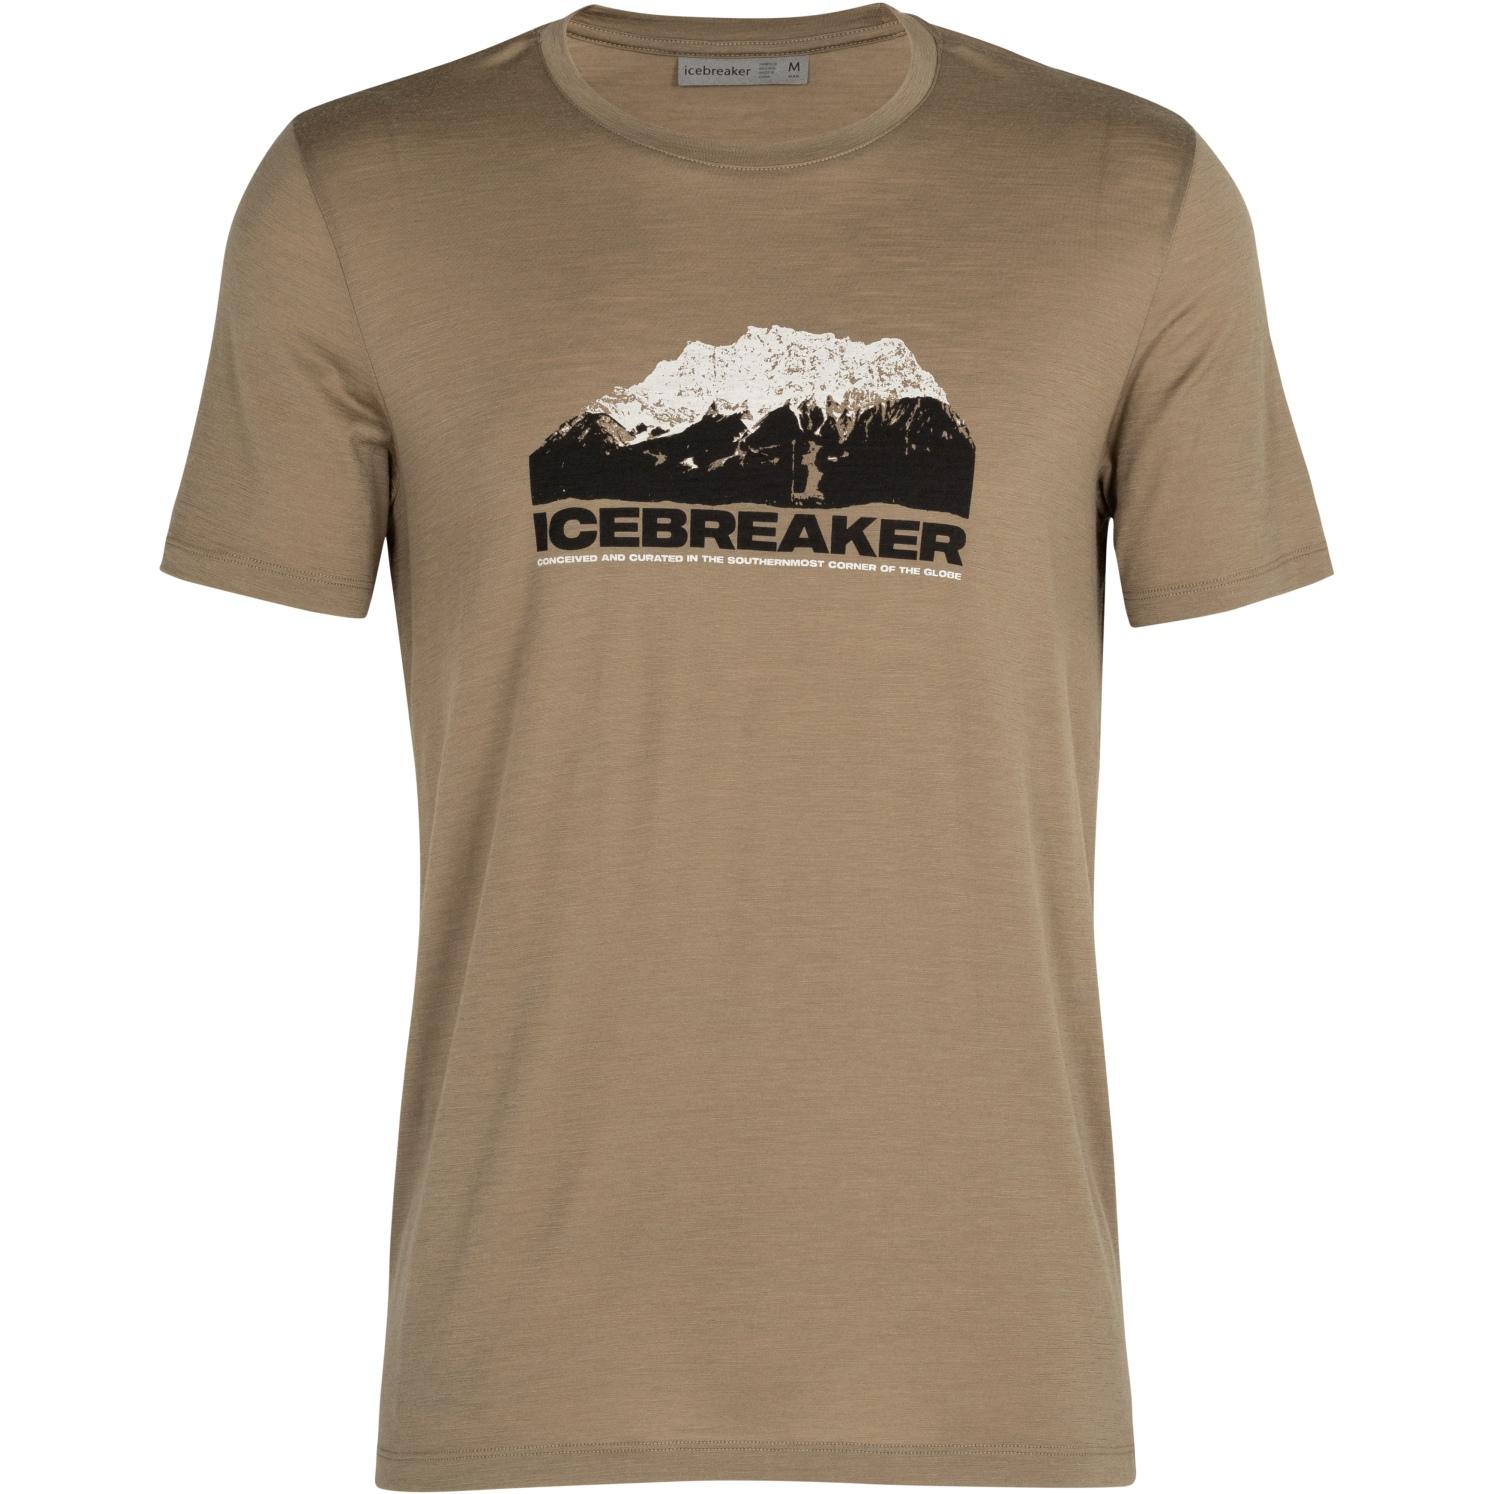 Produktbild von Icebreaker Tech Lite Crewe Icebreaker Mountain Herren T-Shirt - Flint